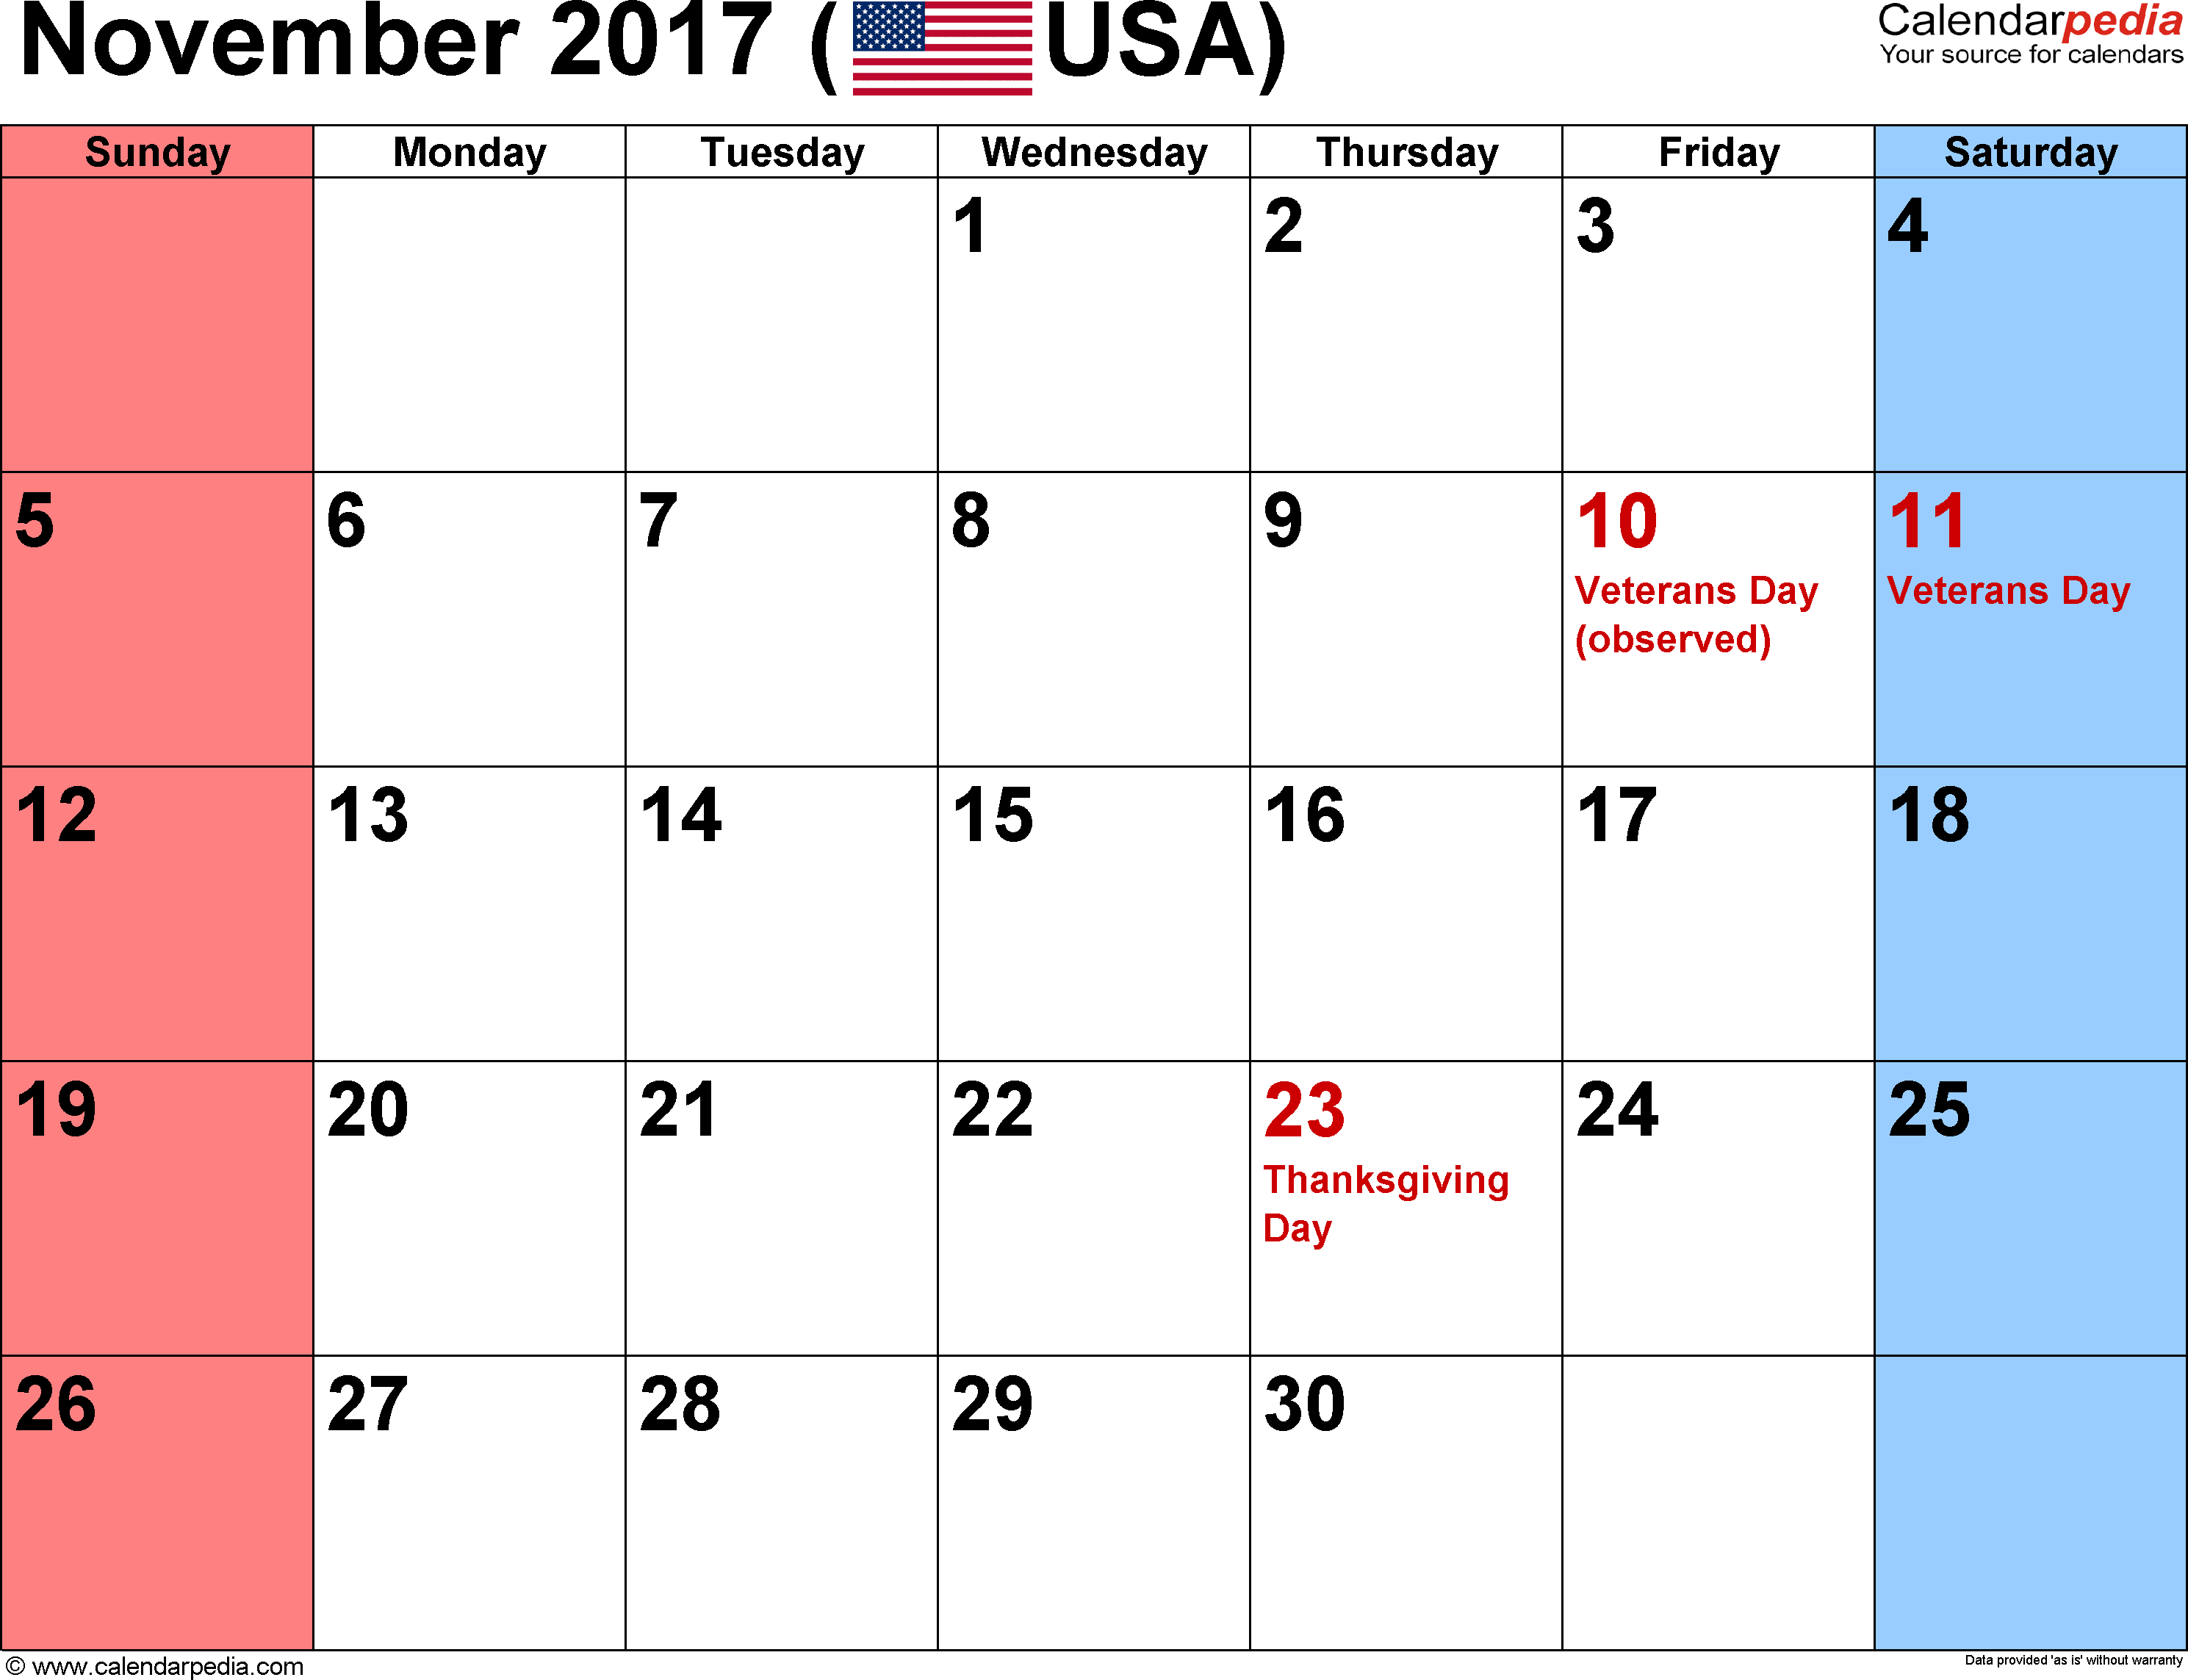 015 Blank Monthly Calendar Template November Ideas Dreaded with regard to November Decorated Calendar